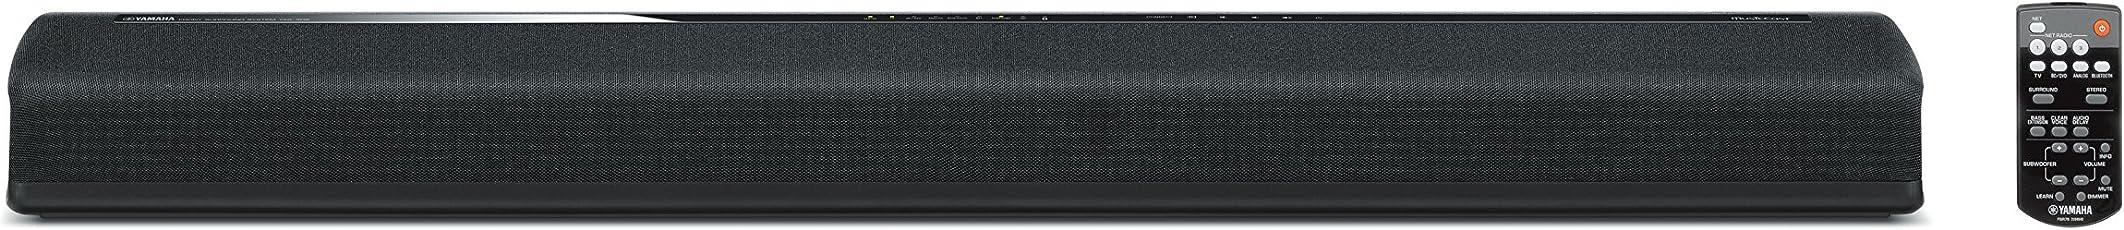 Yamaha YAS-306 MusicCast 7.1 Soundbar schwarz